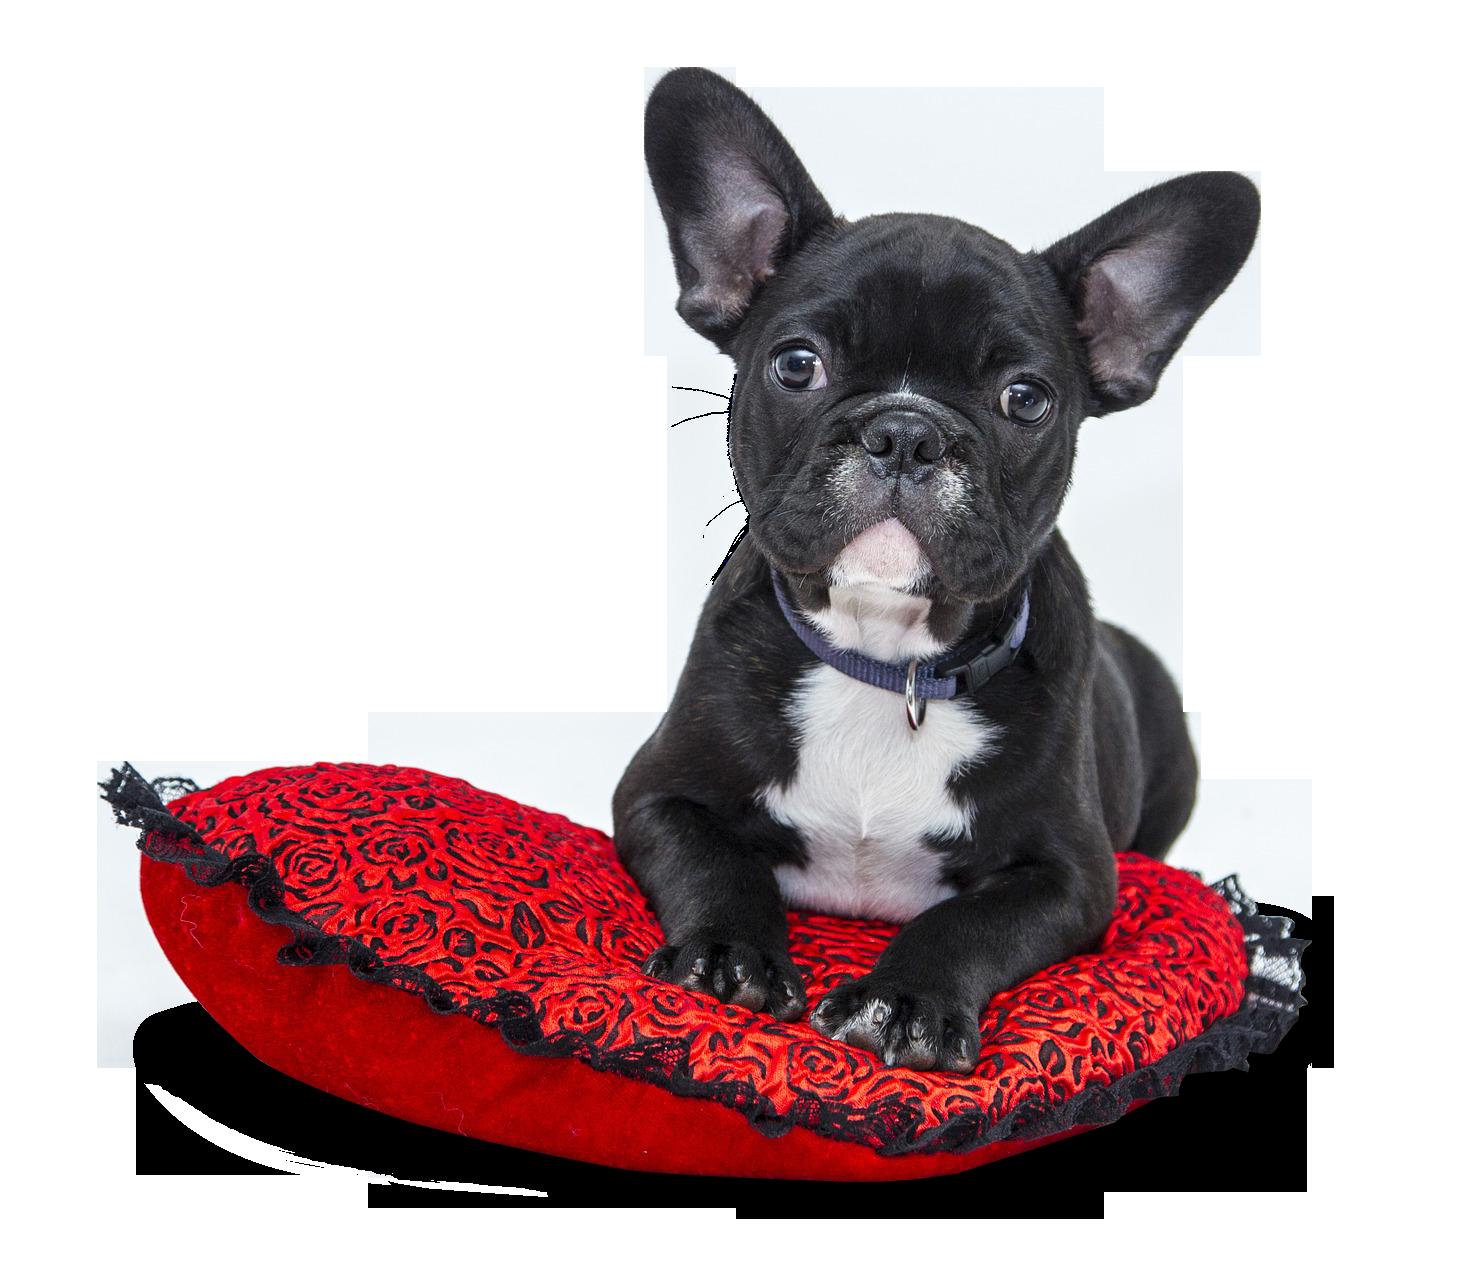 Dog Png Google Search Franzosische Bulldoggenwelpen Franzosische Bulldogge Franzosische Bulldogge Grau